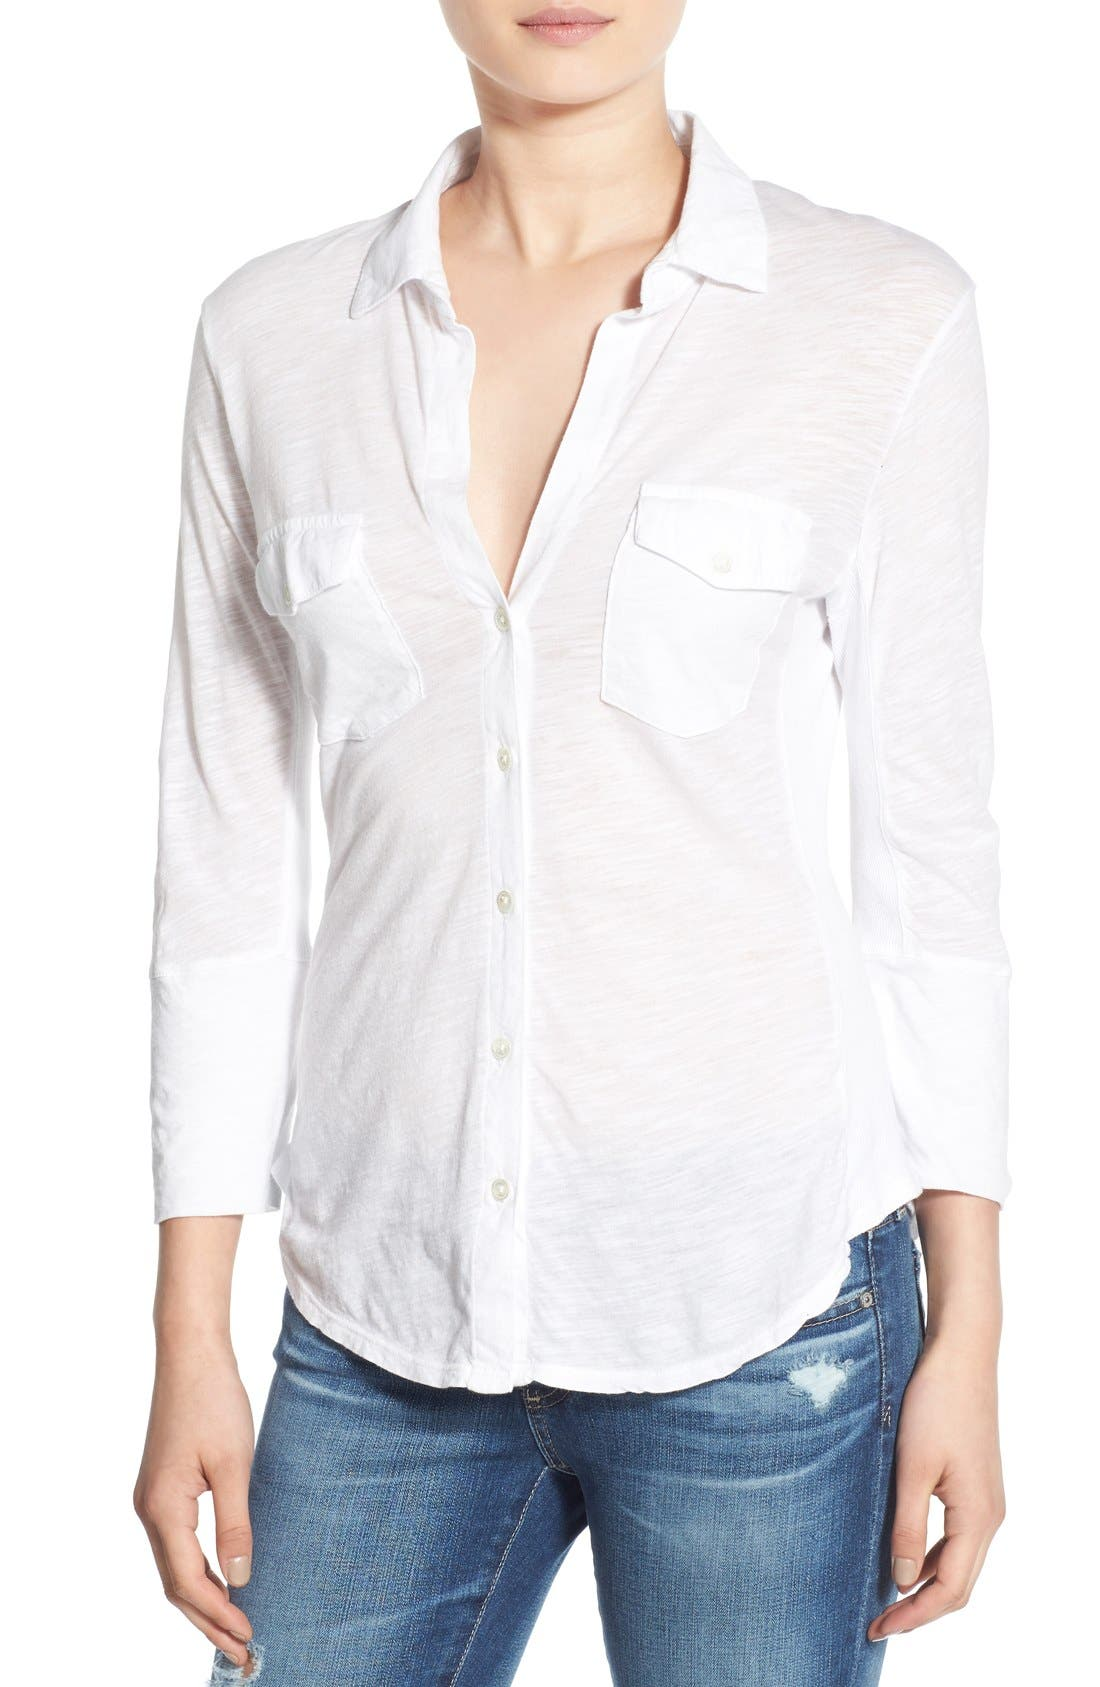 Alternate Image 1 Selected - James Perse Sheer Slub Panel Shirt